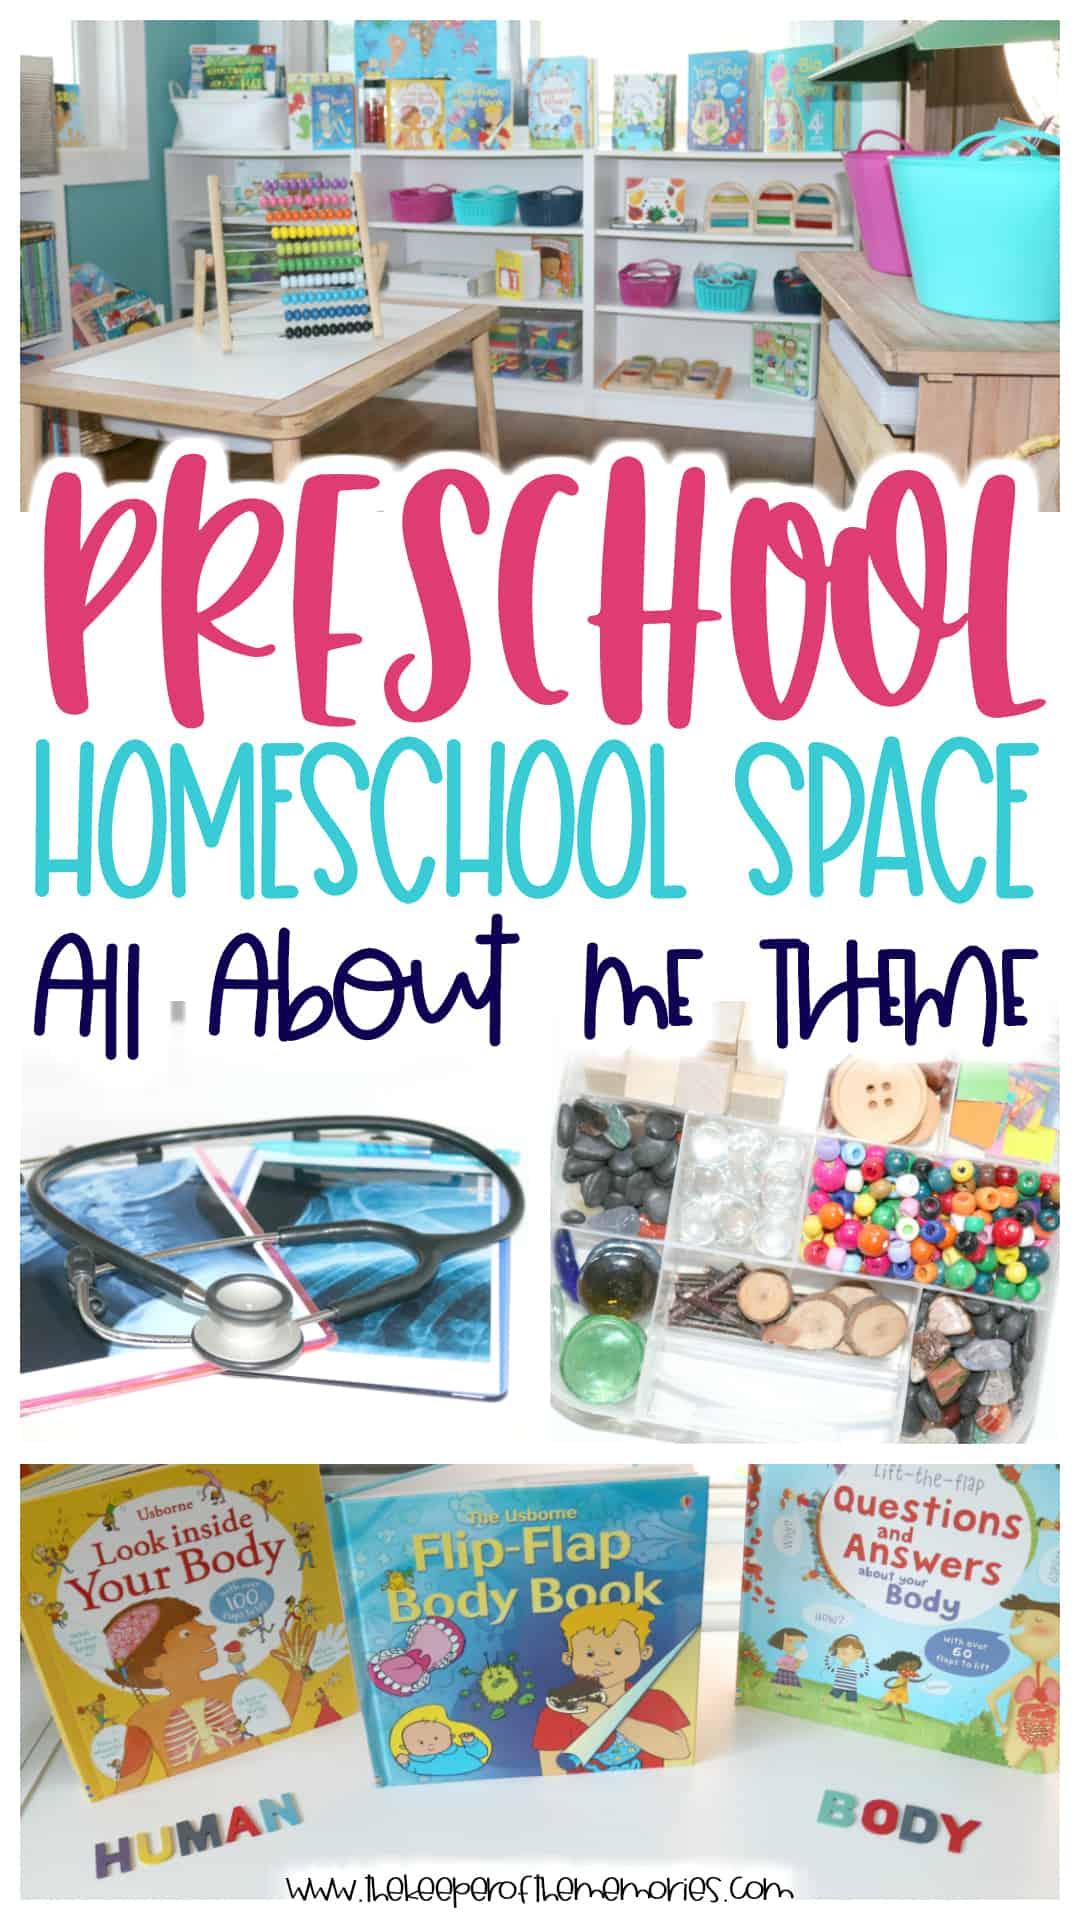 Preschool Homeschool Room Ideas for the 2020-2021 Homeschool Year